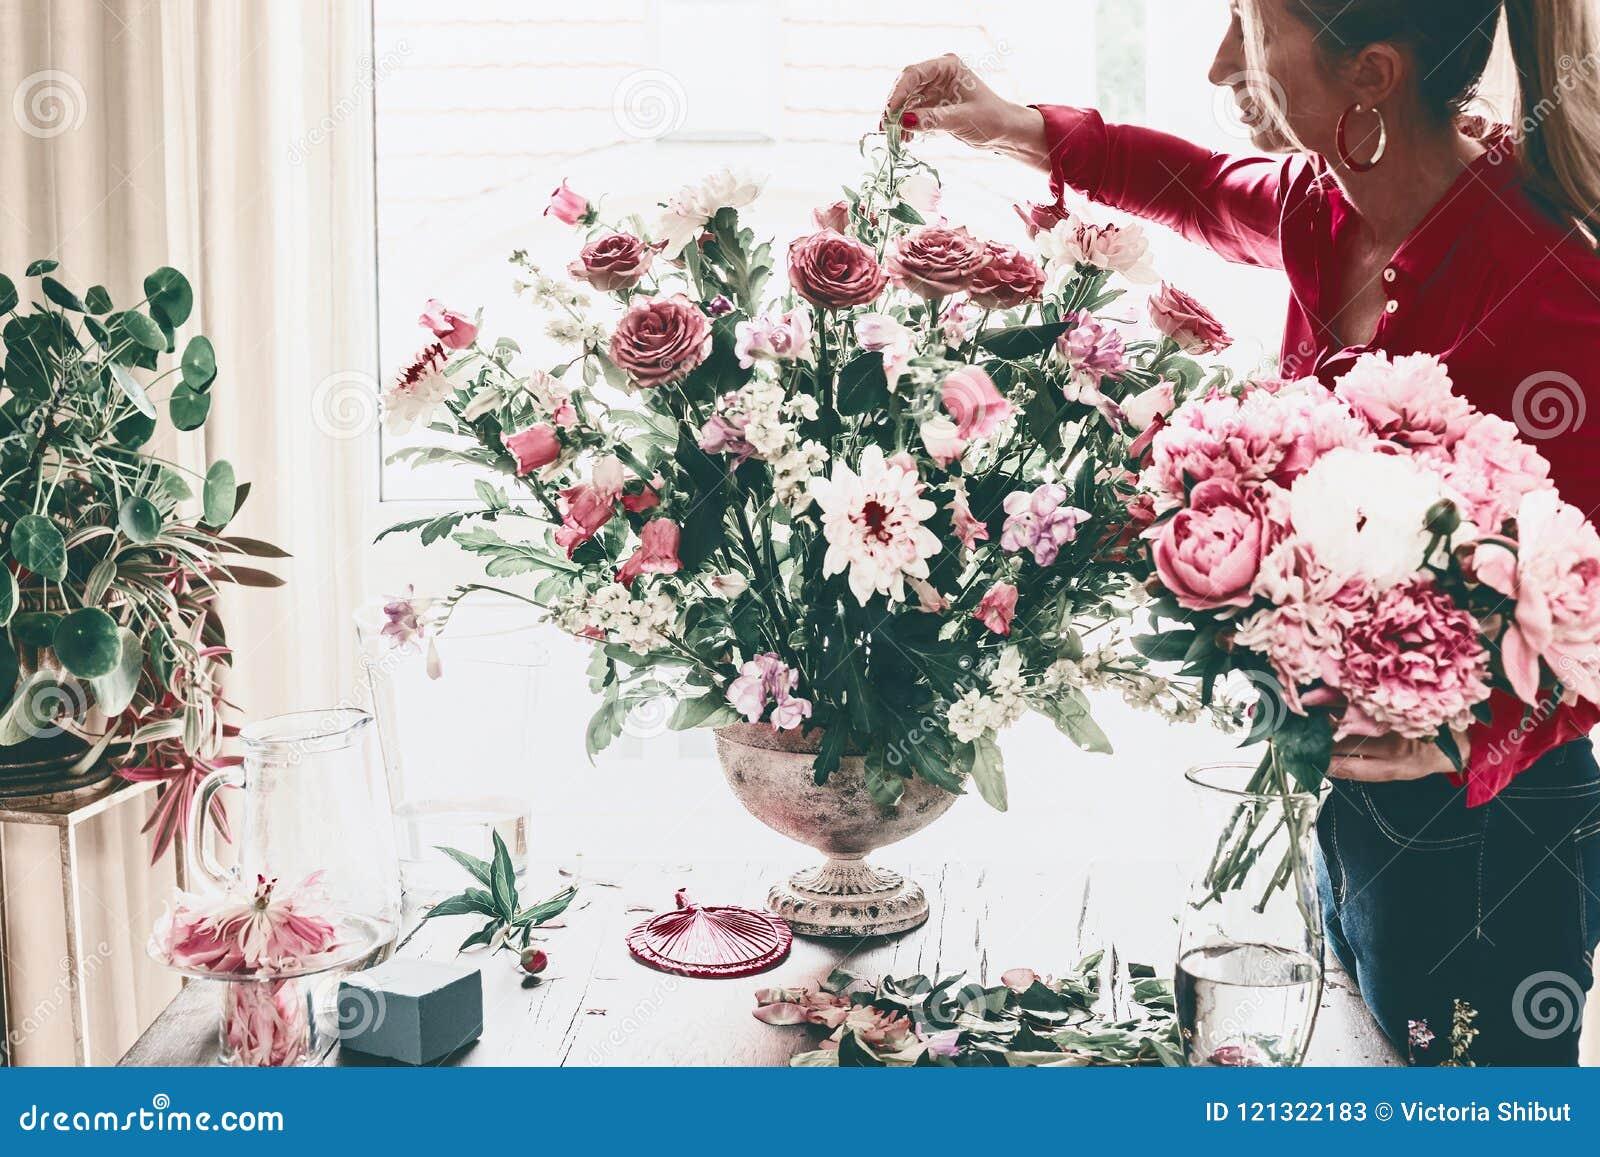 Florist Women Make Beautiful Big Festive Event Classical Bouquet ...